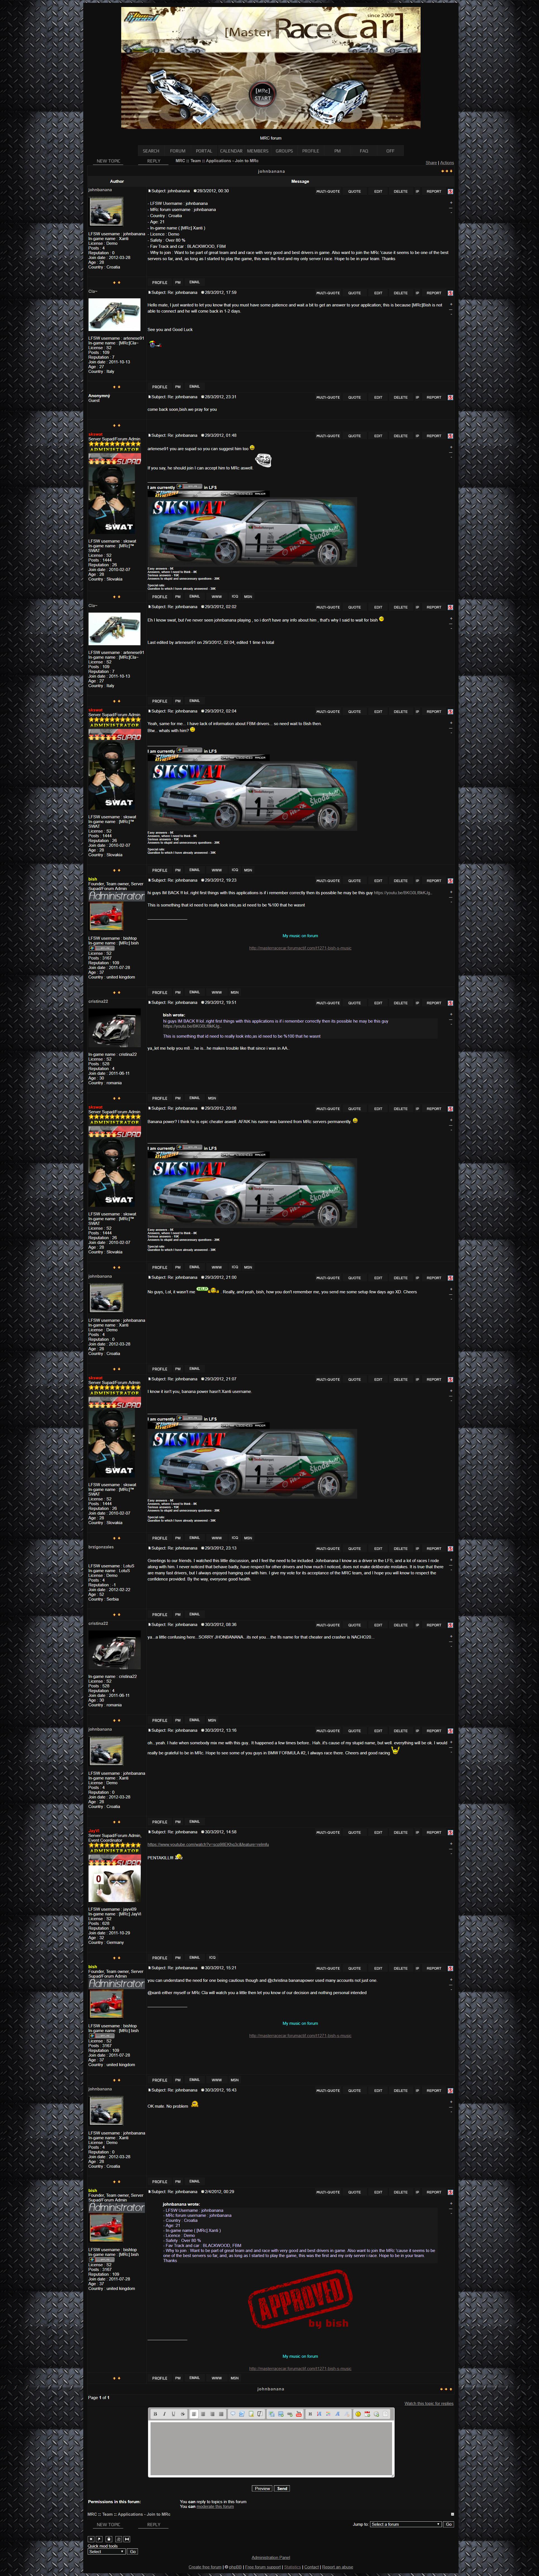 [Image: screencapture-masterracecar-forumactif-t...-26-25.jpg]